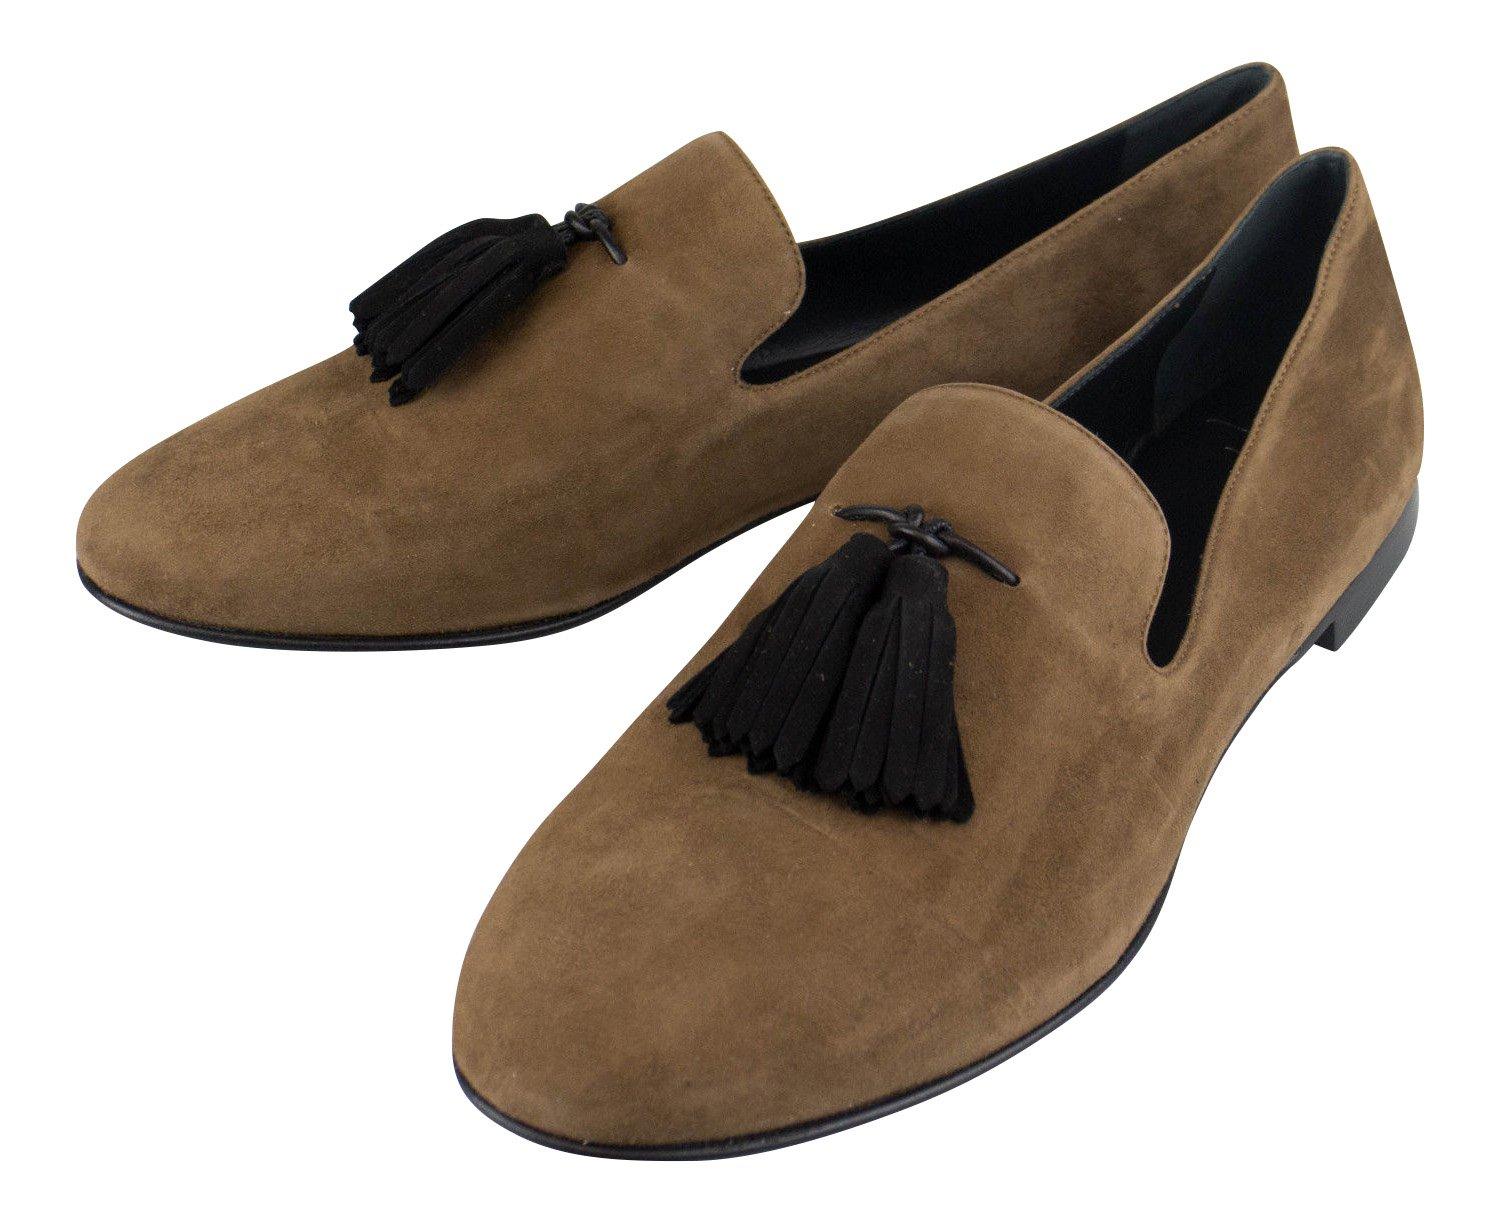 Giuseppe Zanotti Kevin CAMOSCIOスエードスリッパ靴サイズ7 US 40 EU   B0731R4N5S